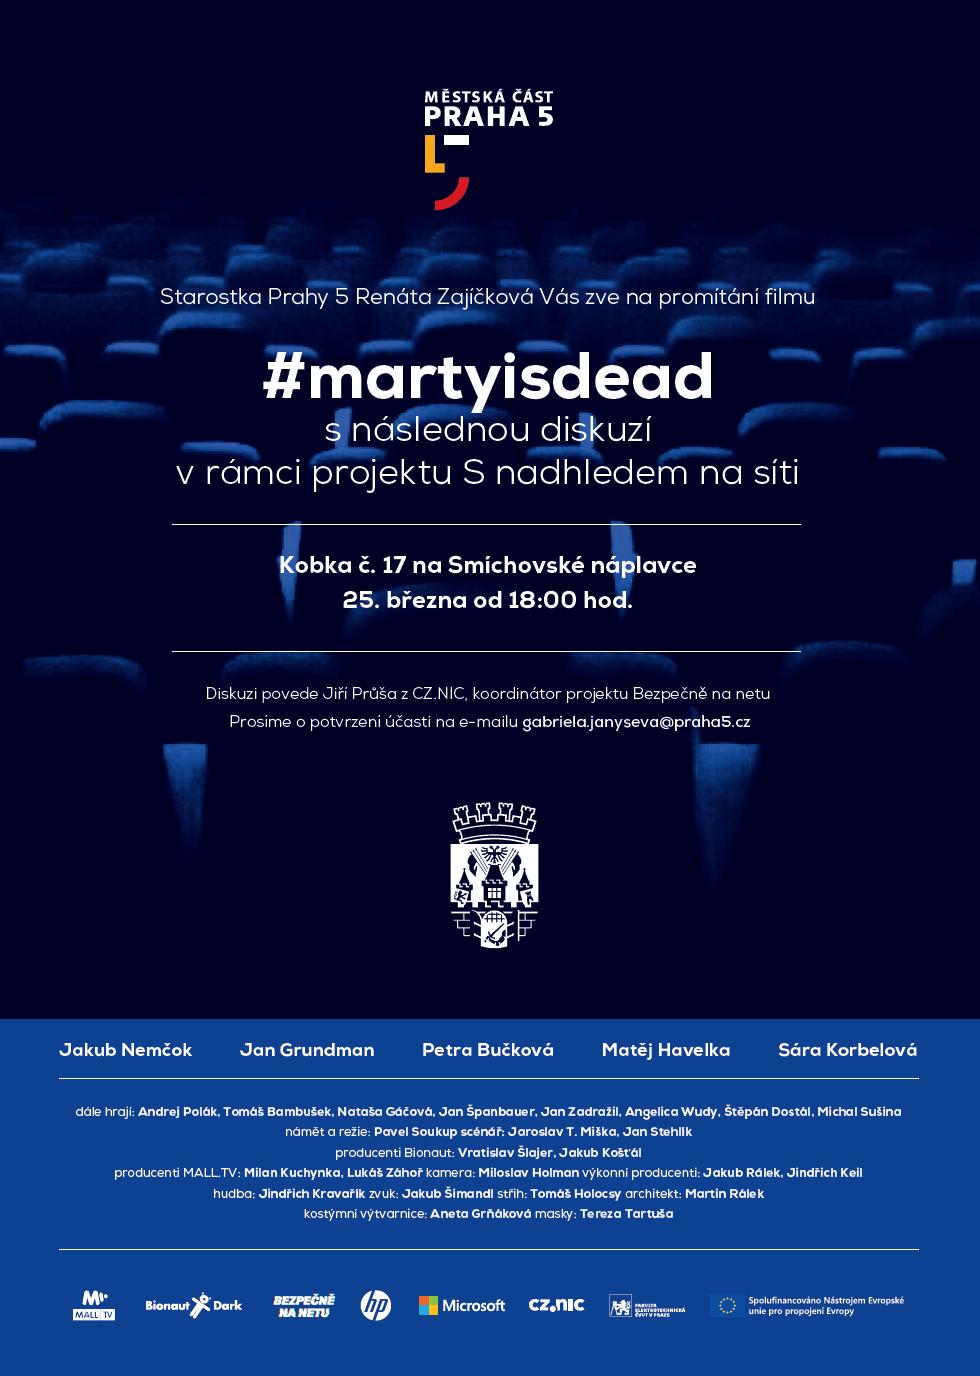 pozvanka-na-promitani-filmu-martyisdead-s-naslednou-besedou